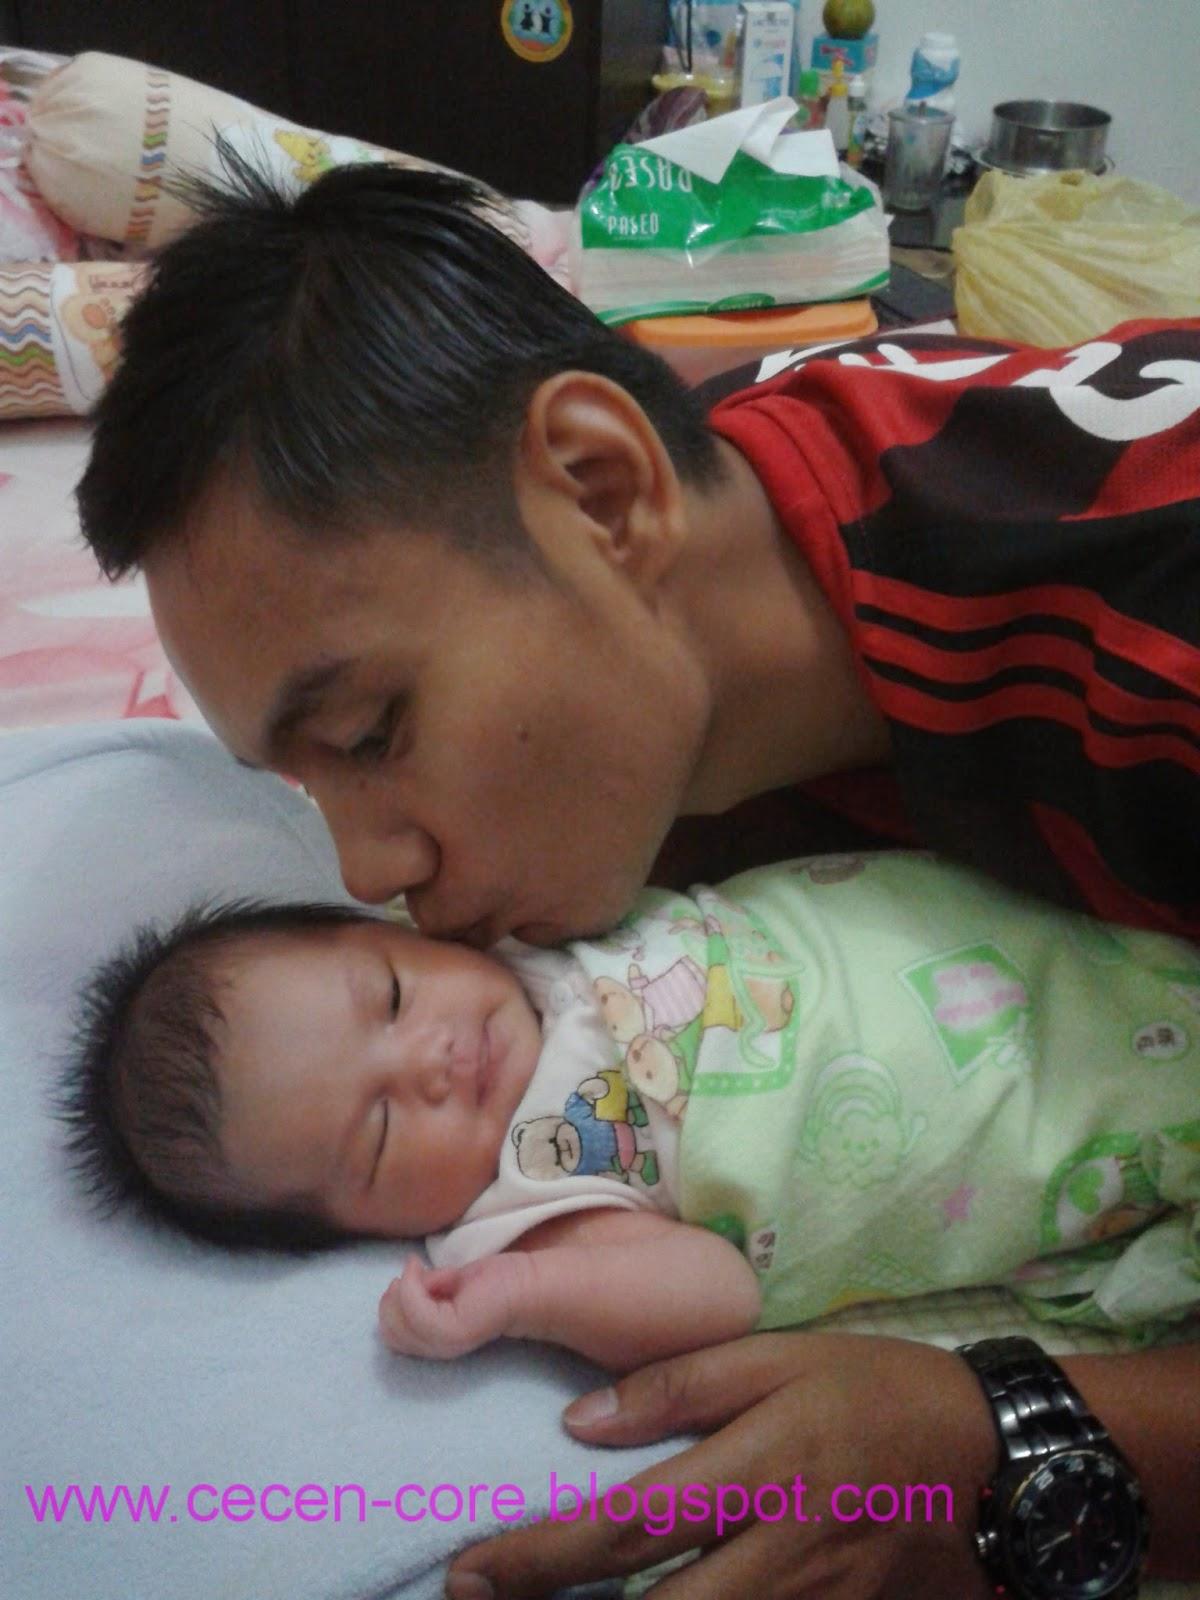 Cecen dan Baby Clarissa Astrid Sofia Friezcen